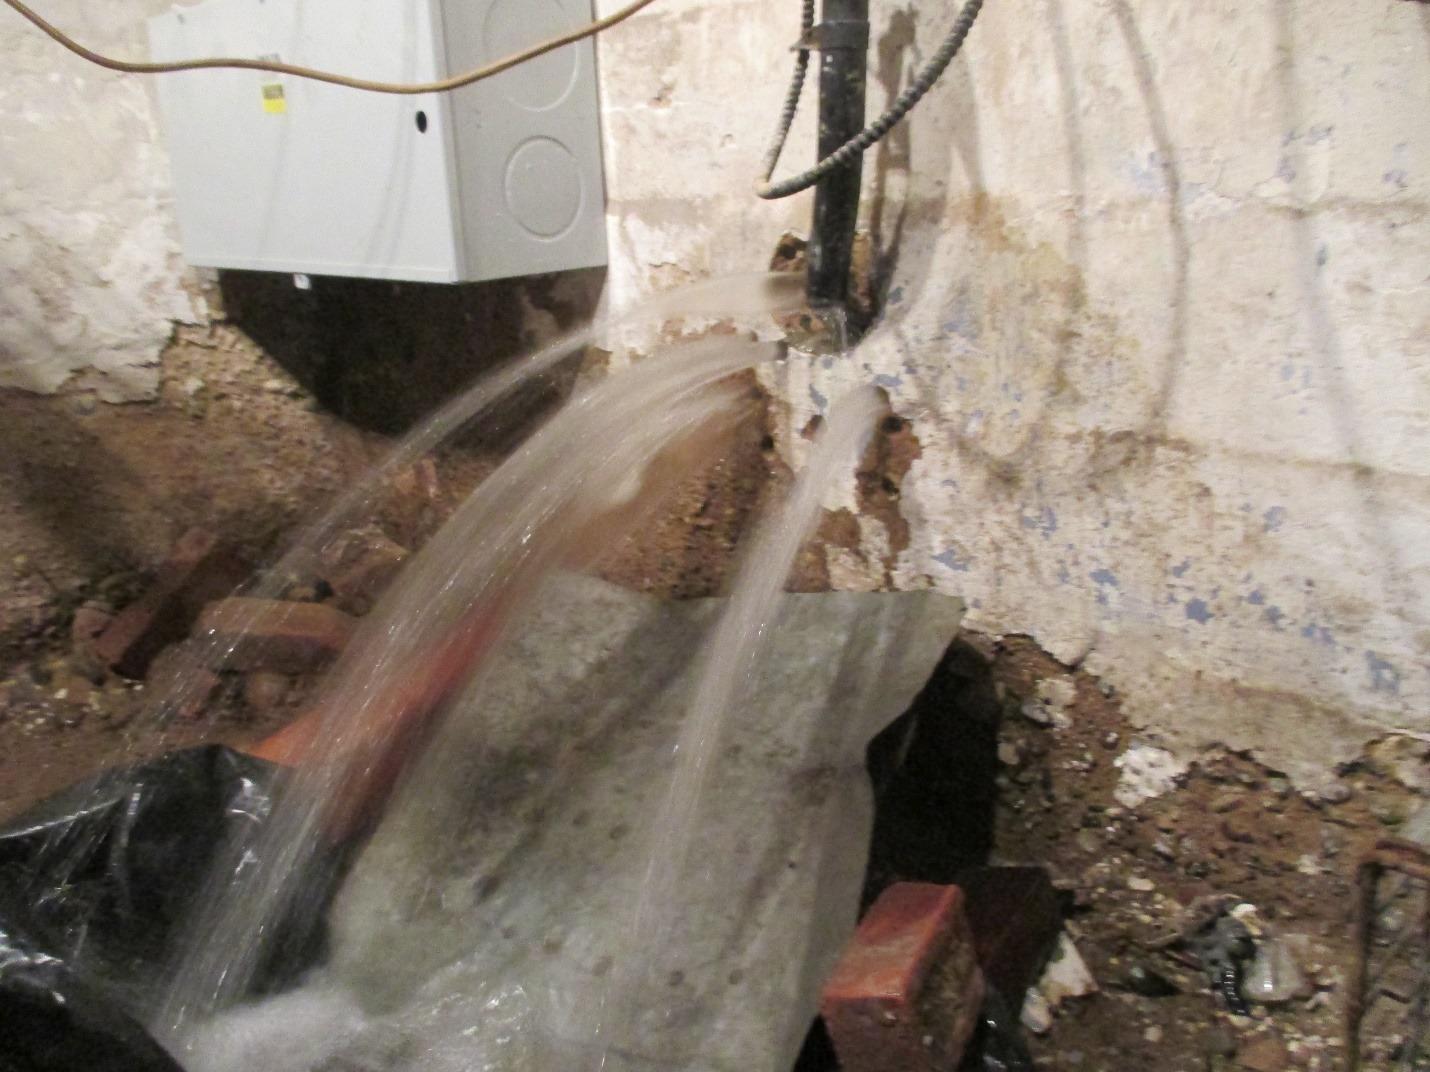 Water leaking inside home